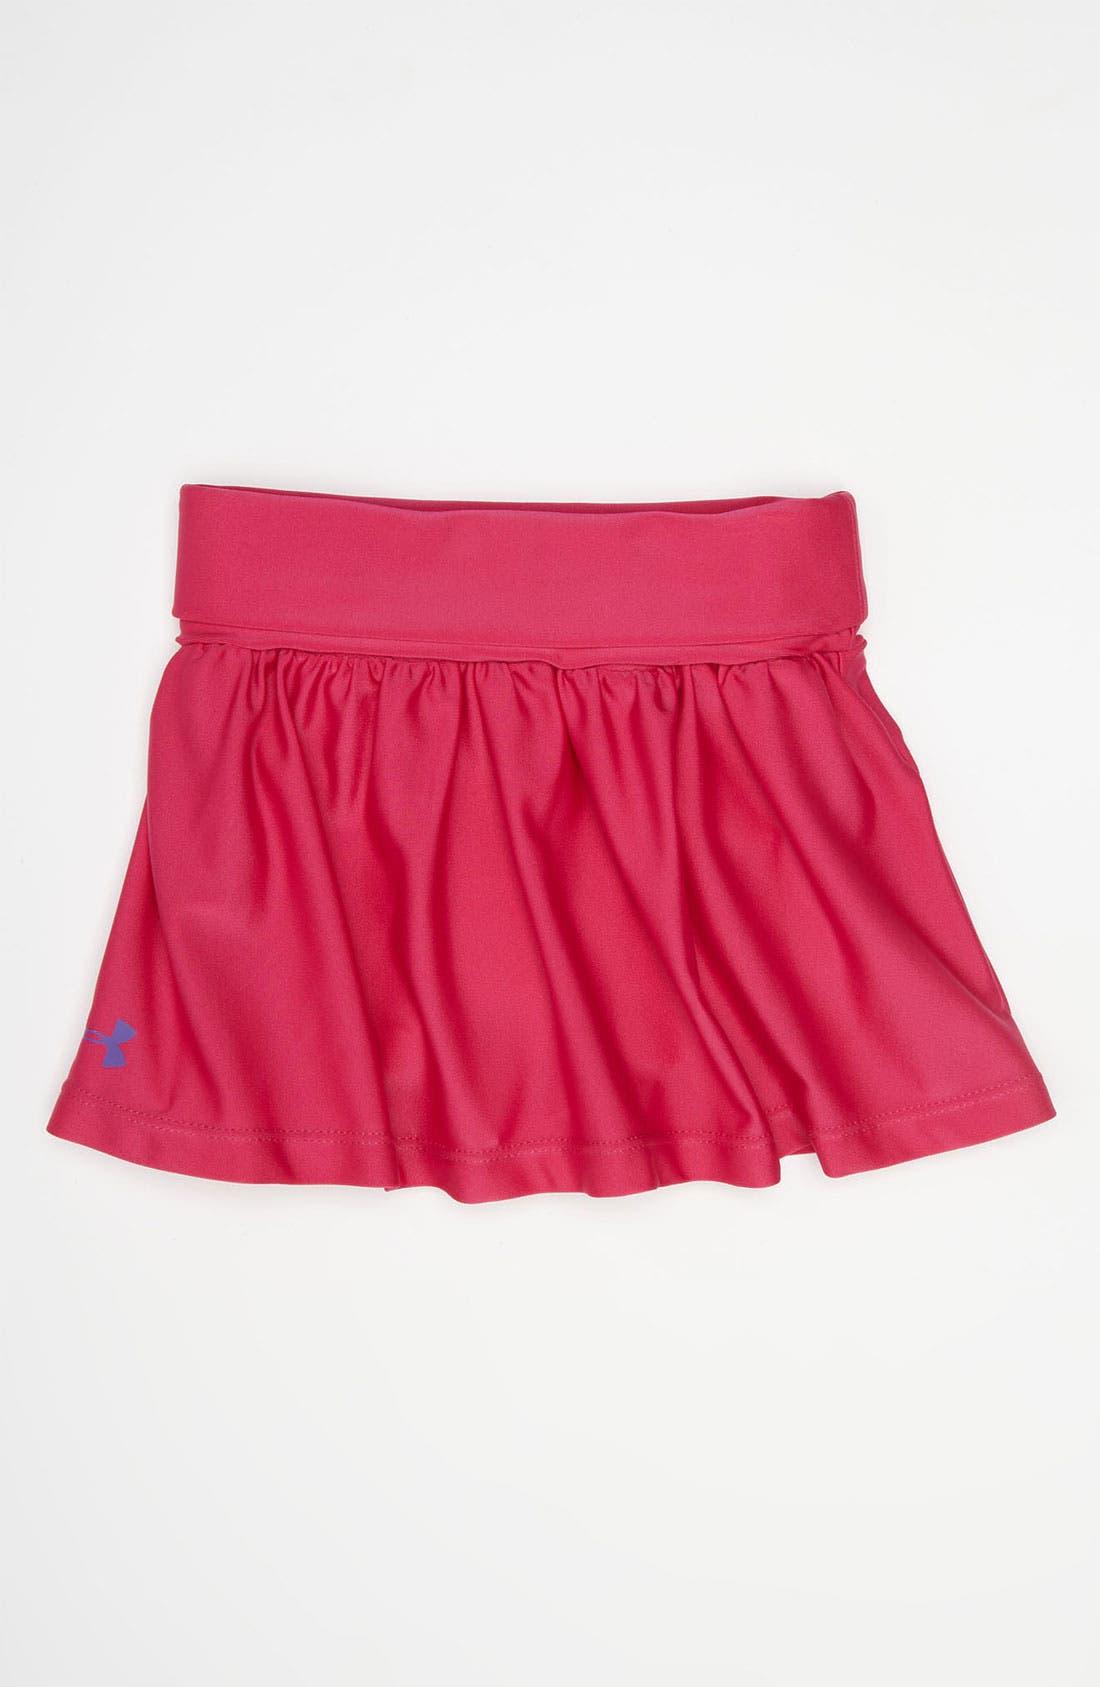 Alternate Image 1 Selected - Under Armour Tennis Skirt (Toddler)